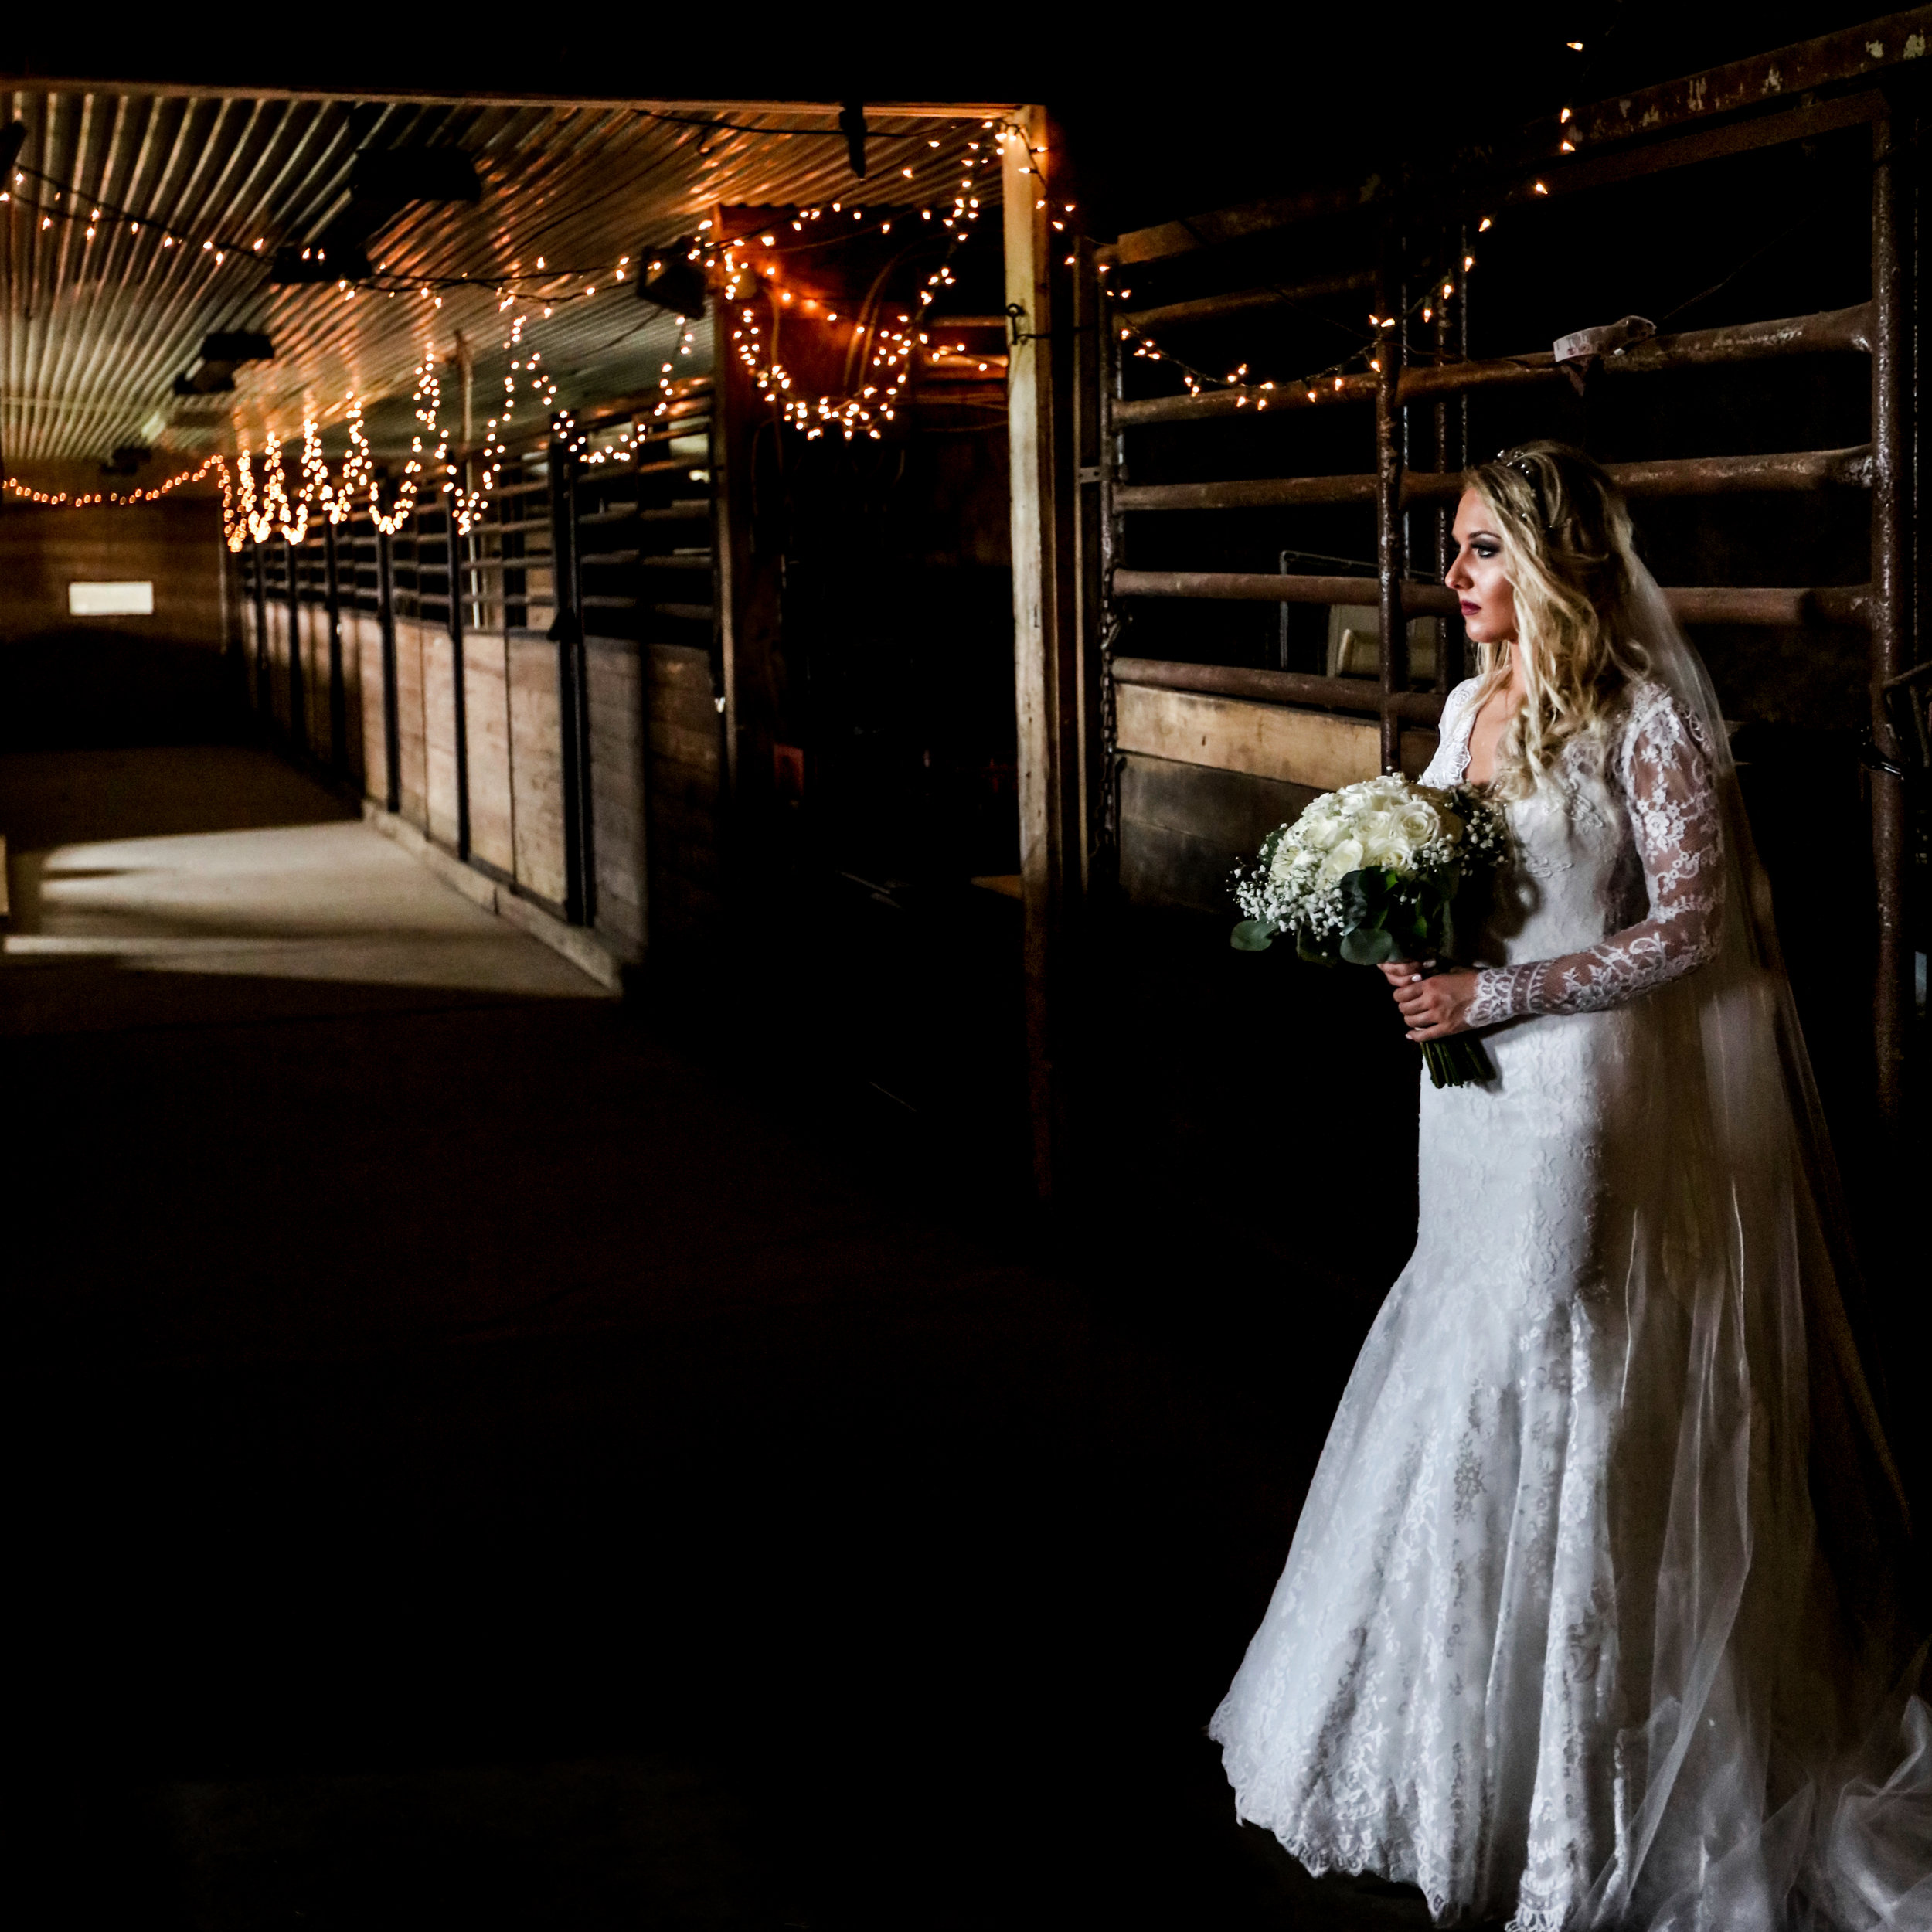 WeddingWebsite-32.jpg